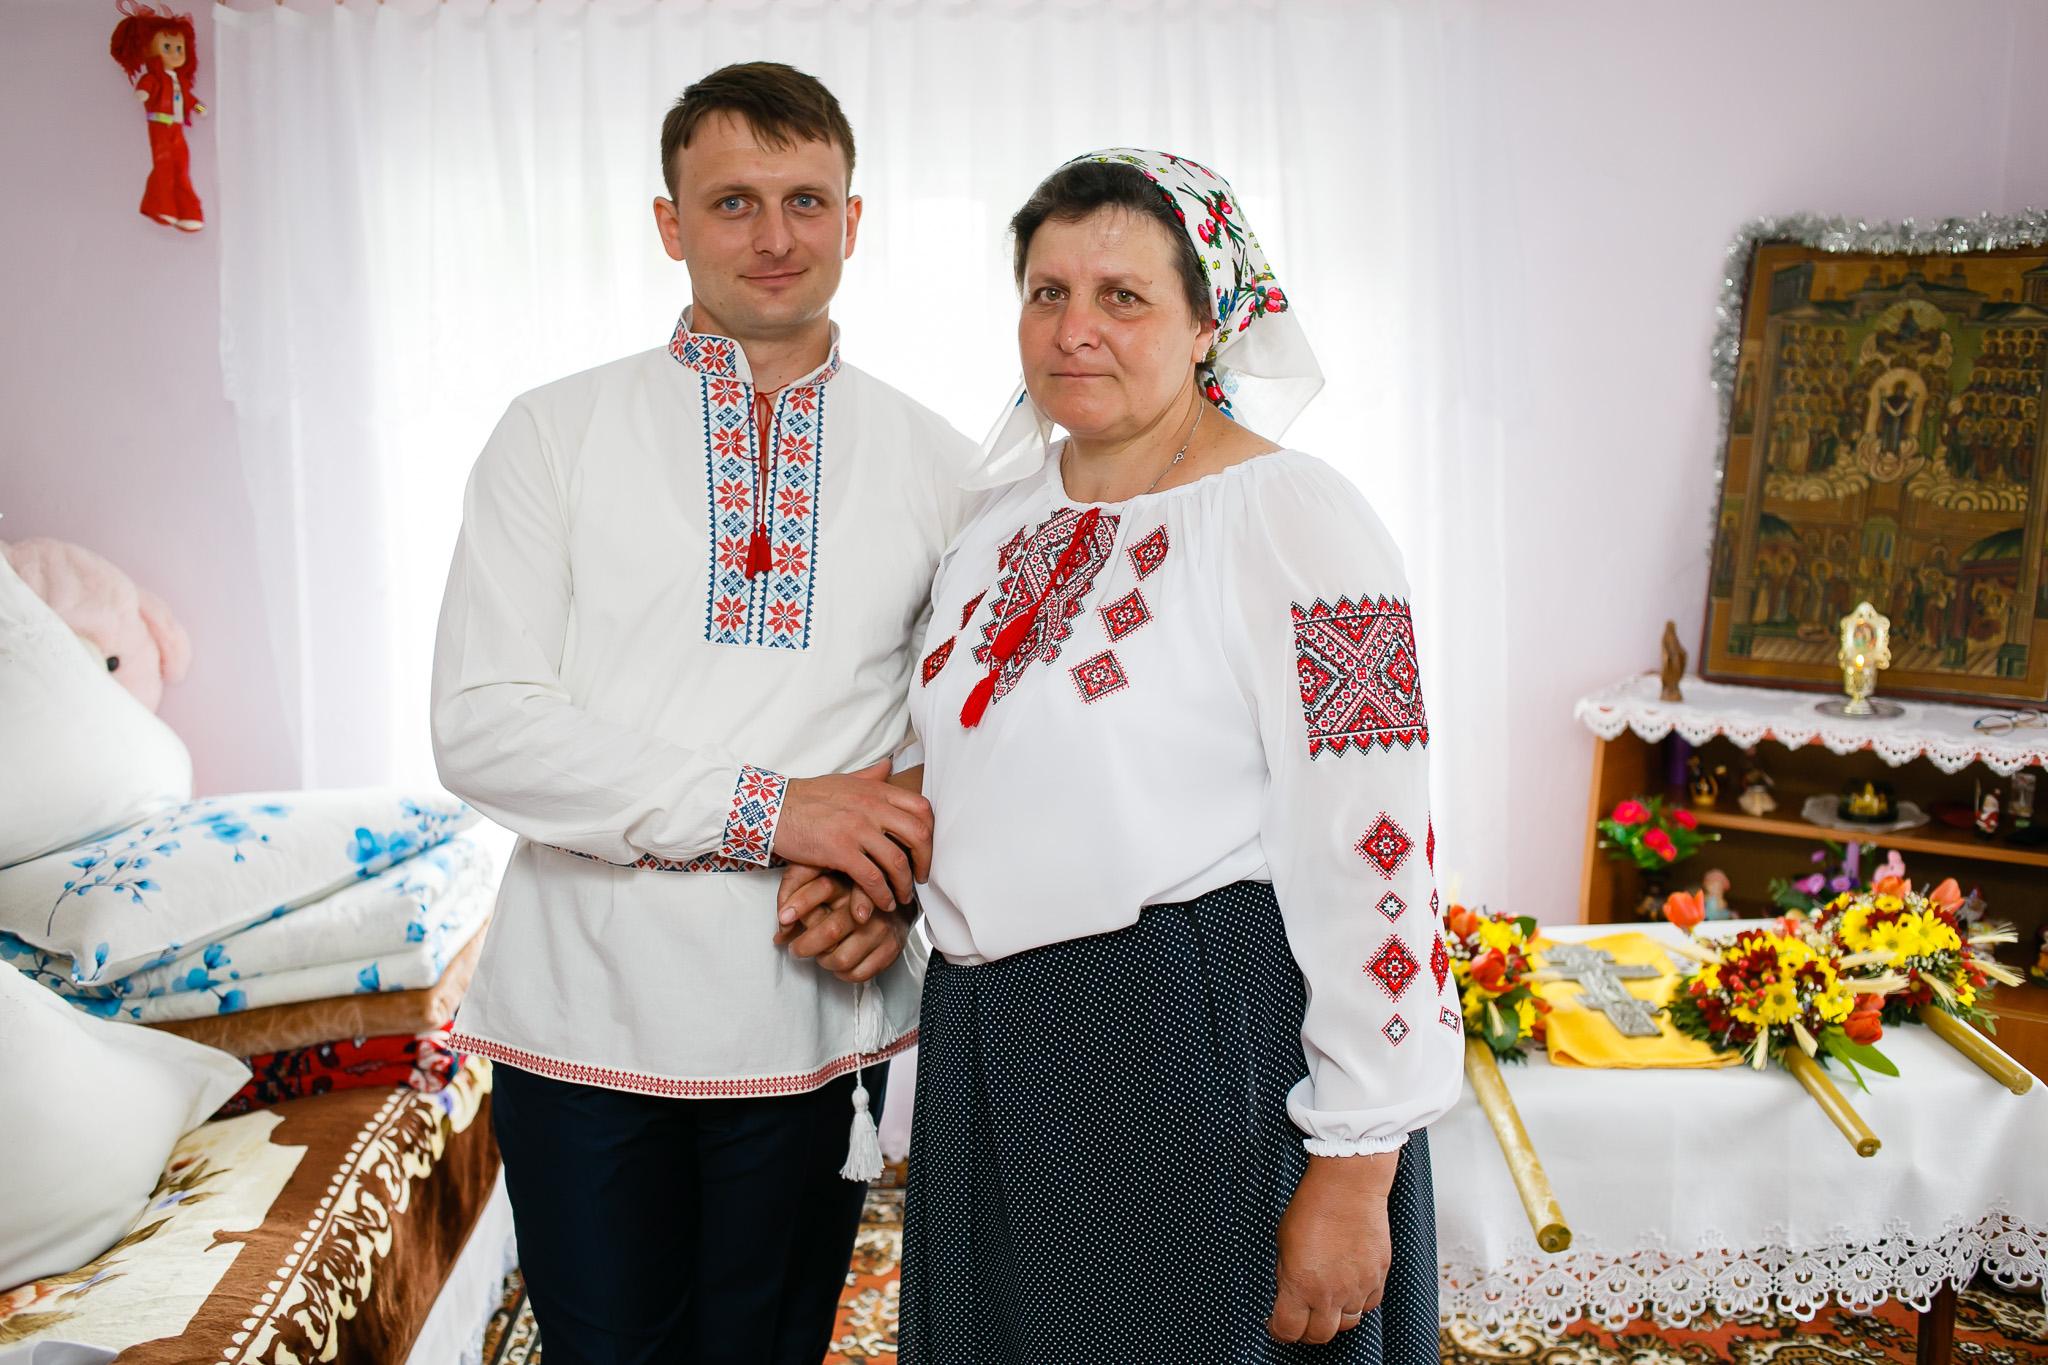 Nuntă tradițională Elisabeta și Alexandru fotograf profesionist nunta Iasi www.paulpadurariu.ro © 2018 Paul Padurariu pregatiri miri 3